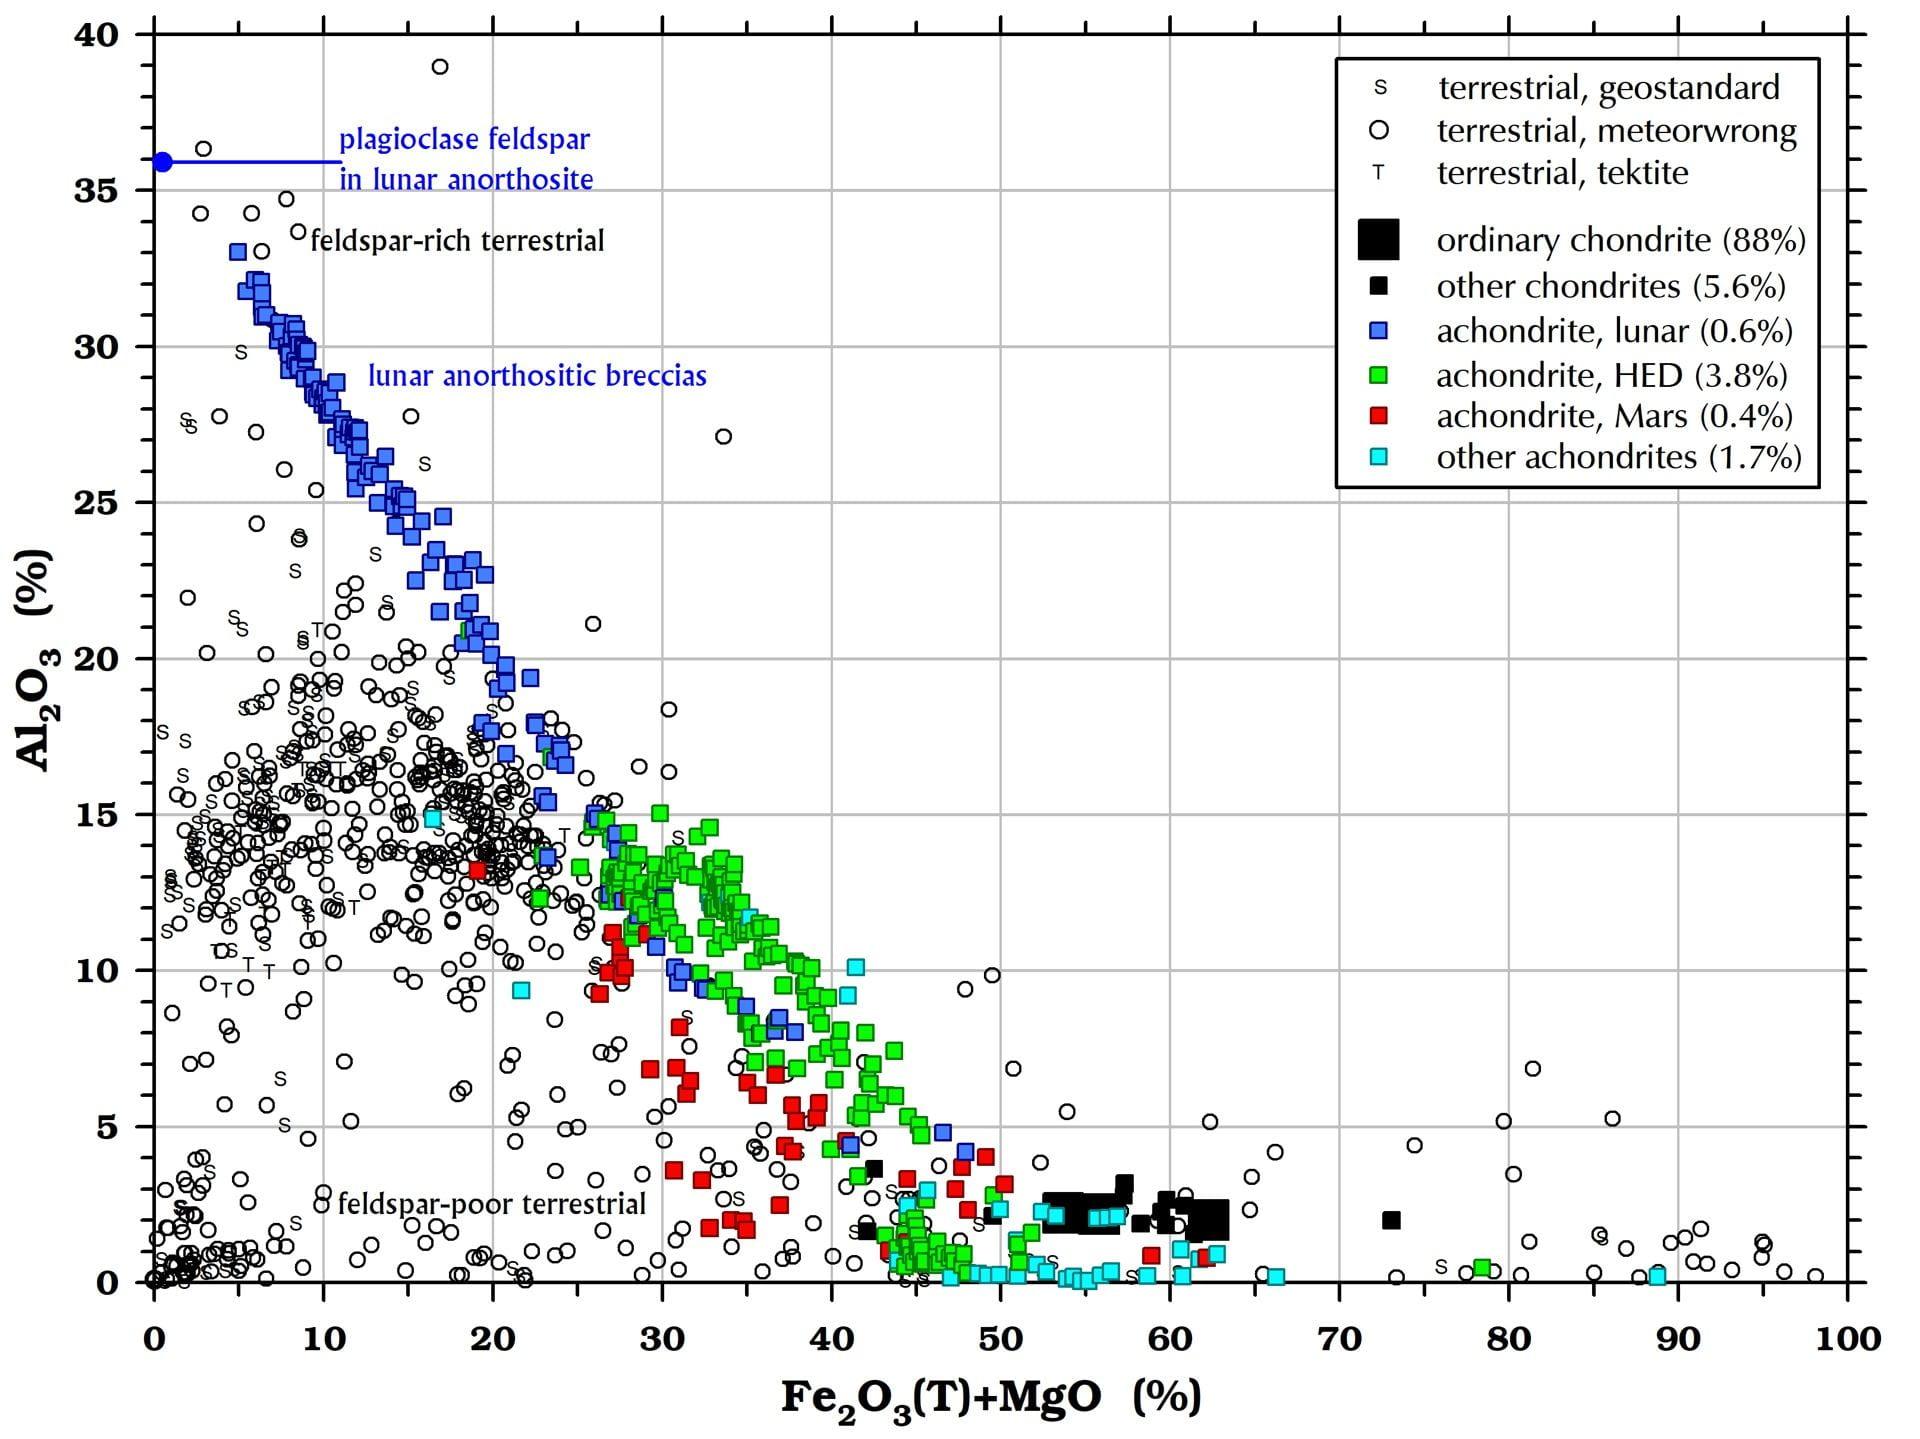 Aluminum (Al2O3) in meteorites and terrestrial rocks